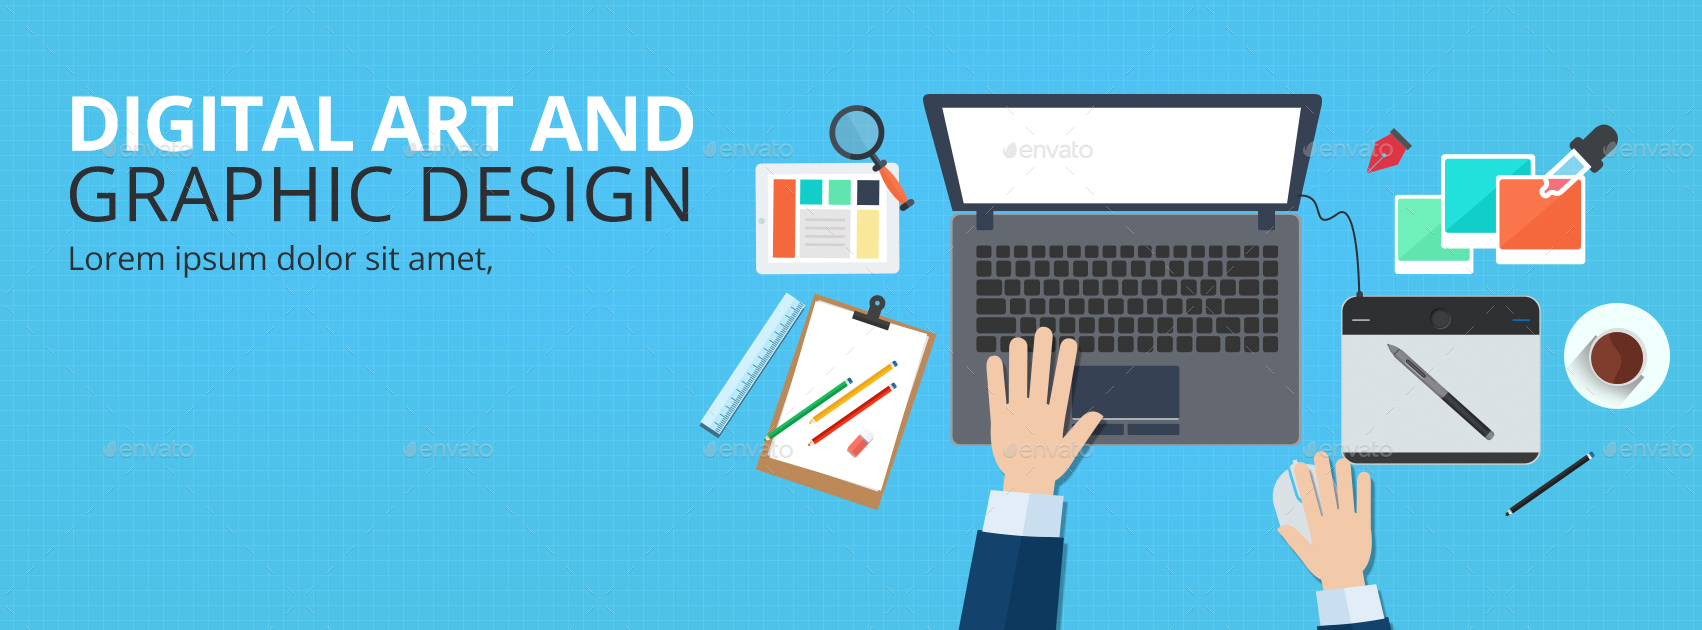 Web & Graphic Design Facebook Cover by doto | GraphicRiver